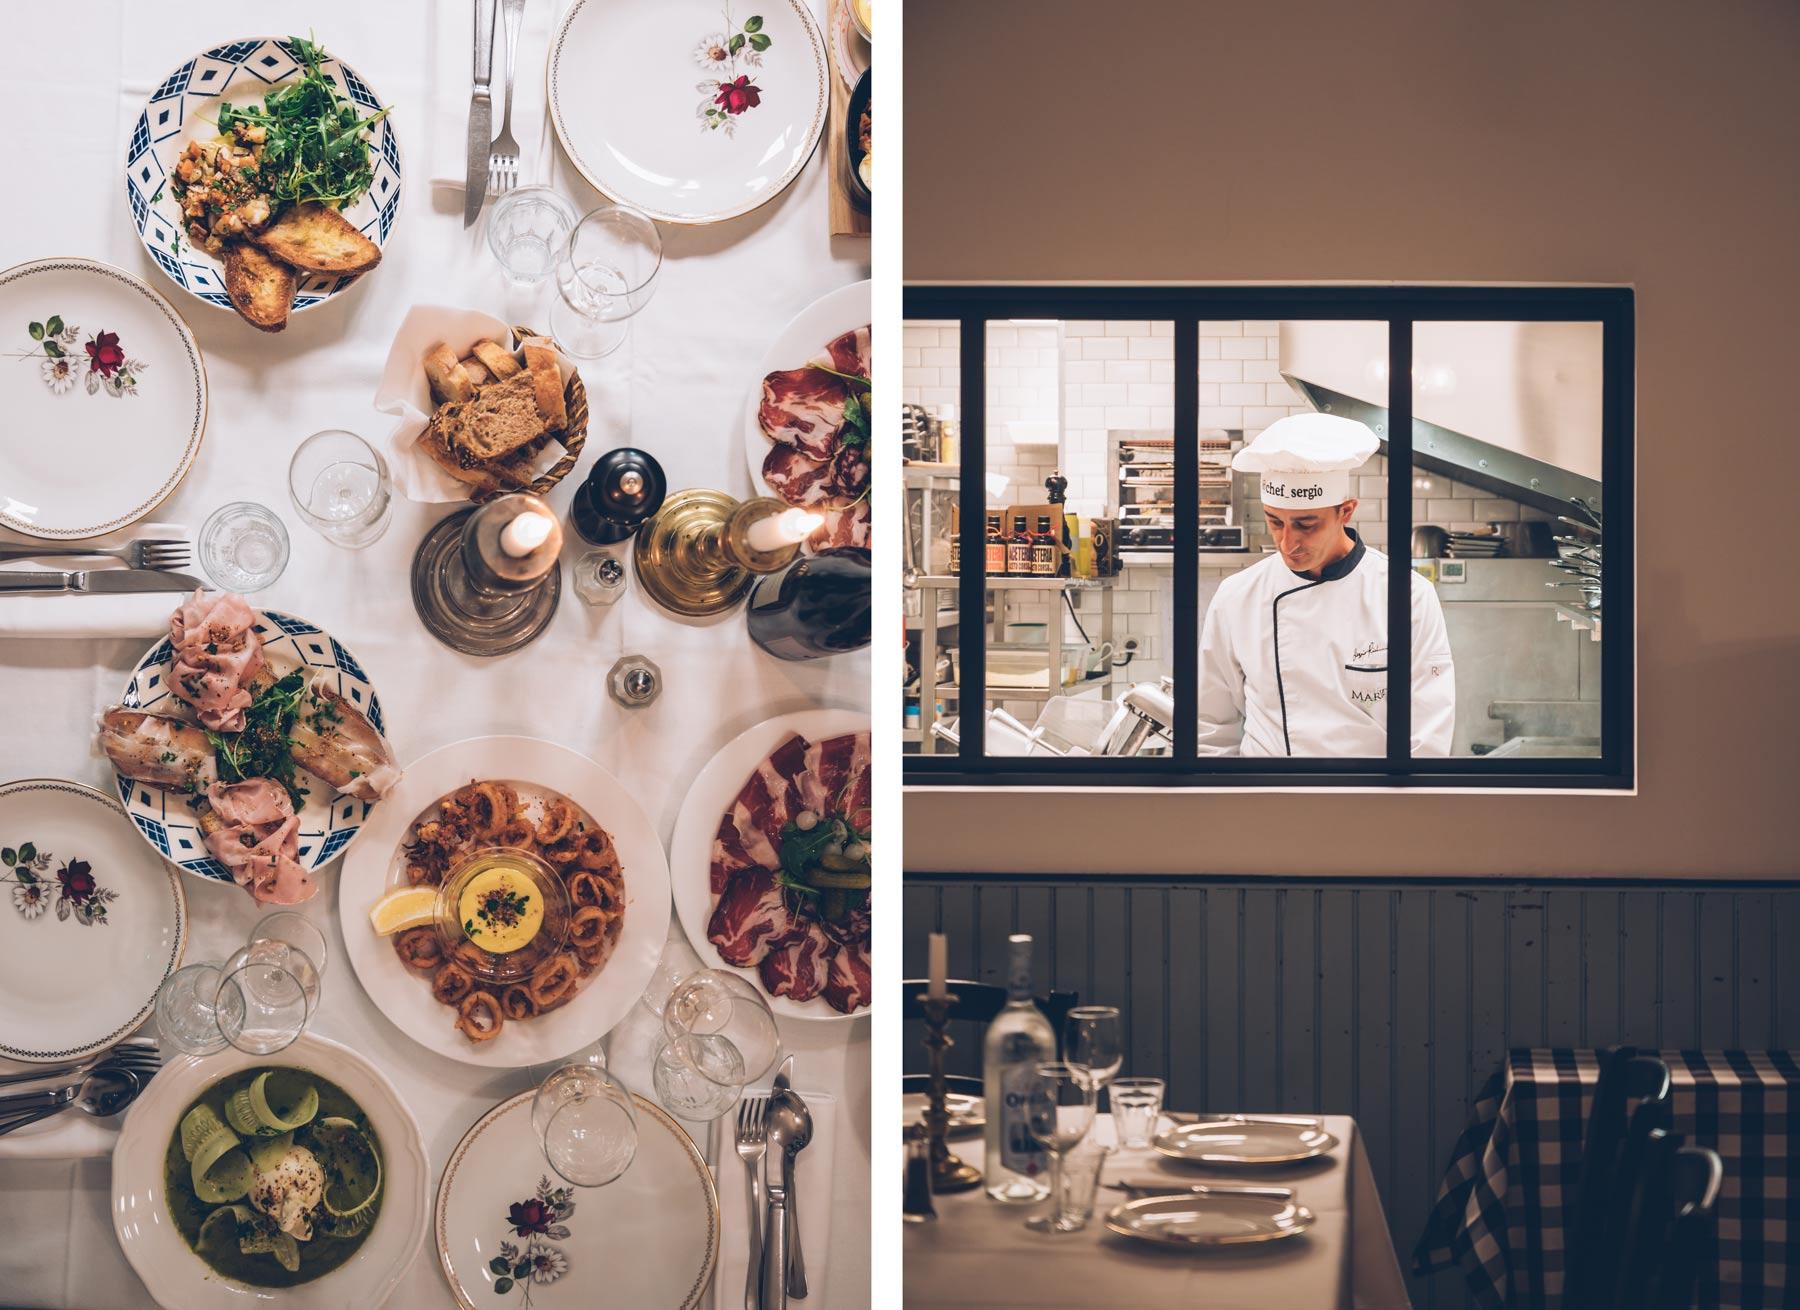 Restaurant tendance en Corse